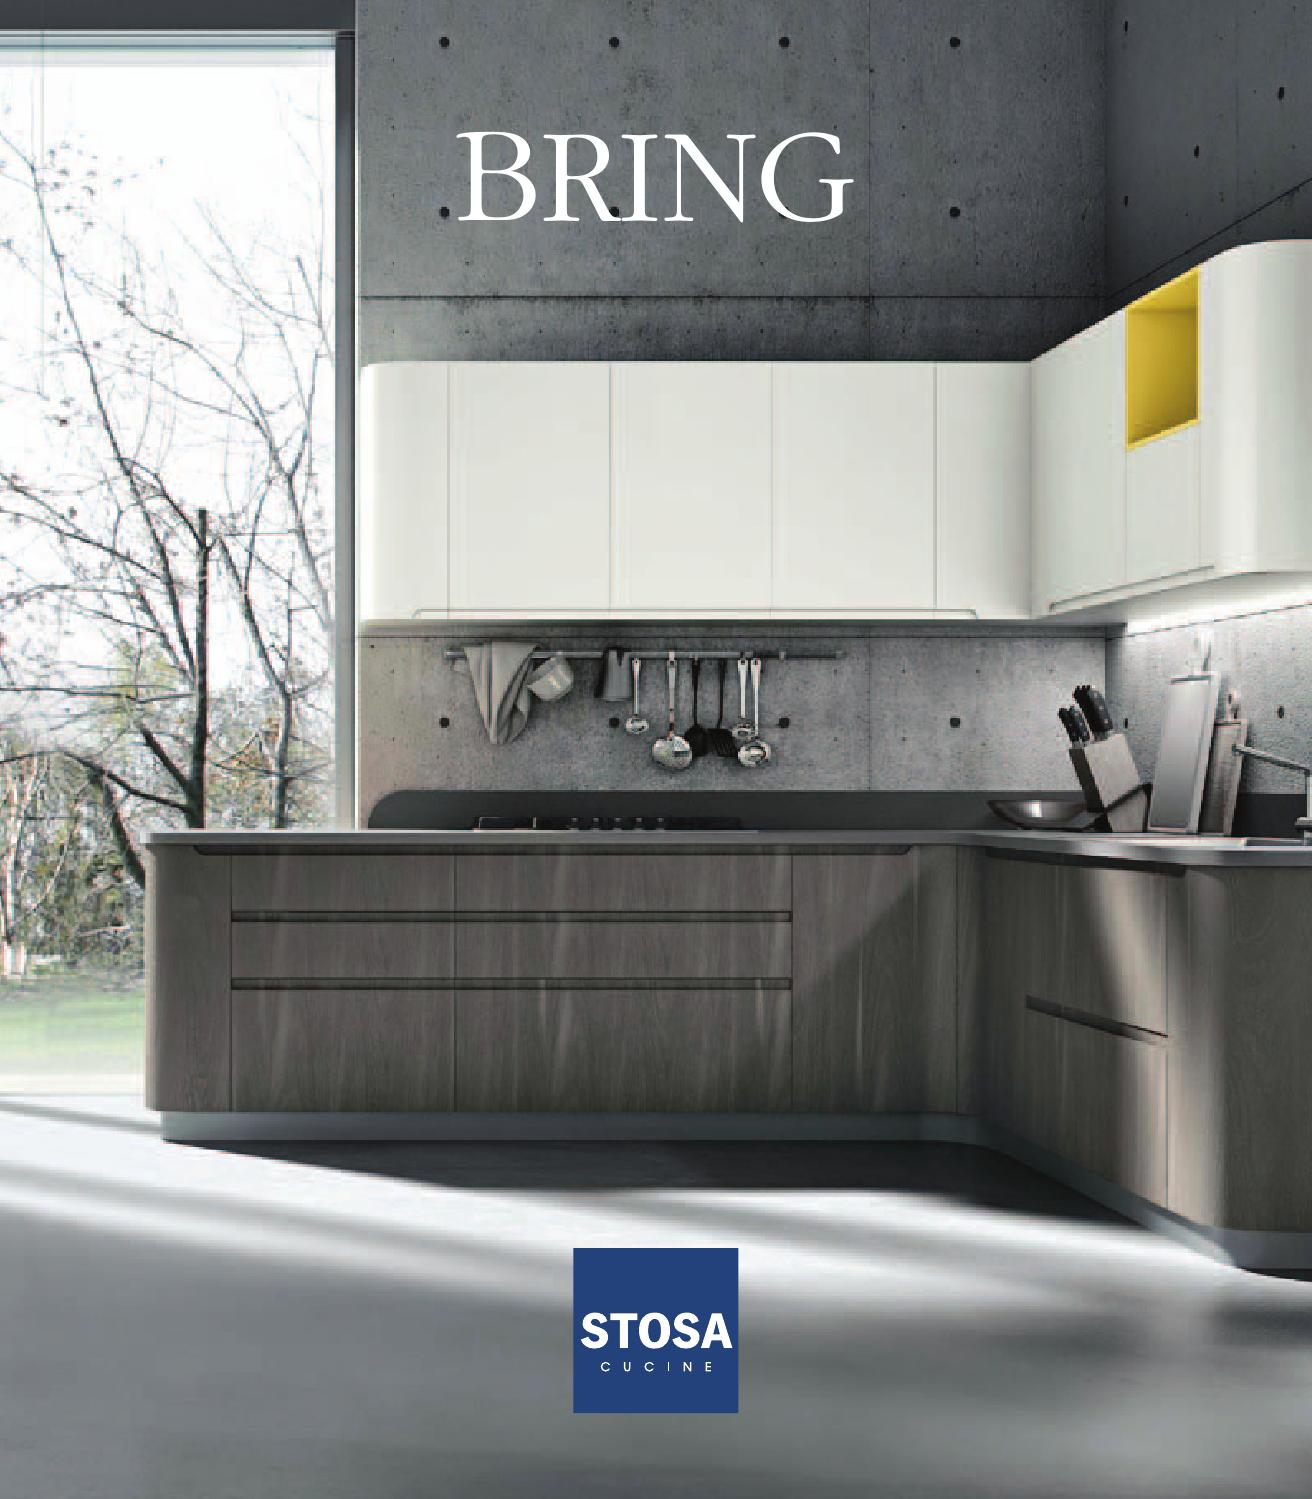 Stosa Cucine Moderne by Irina Medvedeva - Issuu